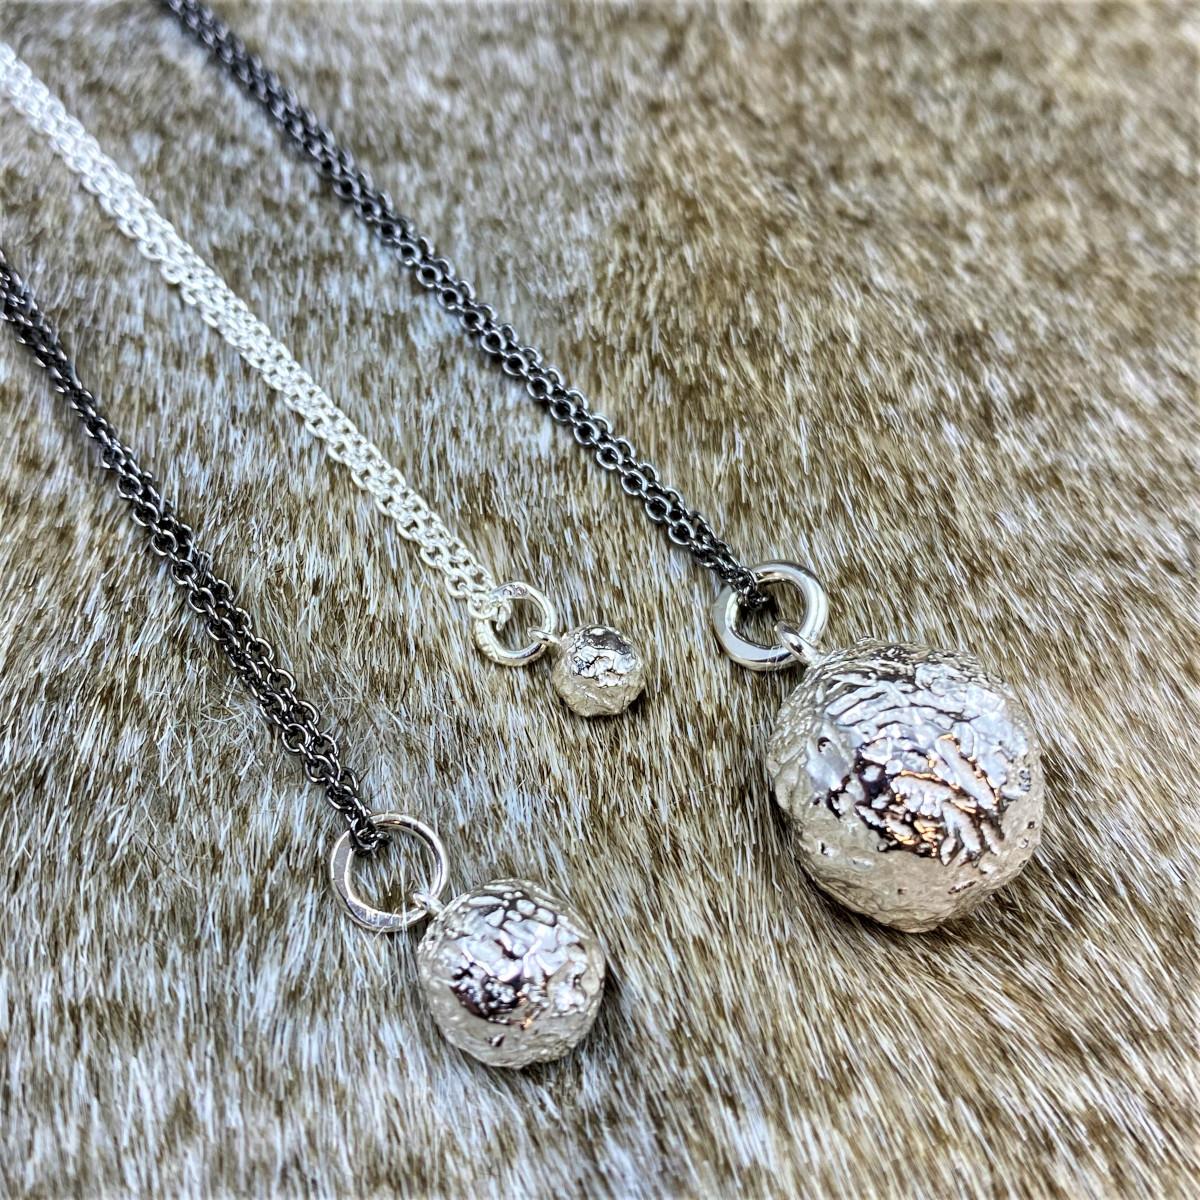 Hängsmycke, silversmycke, silverbollar